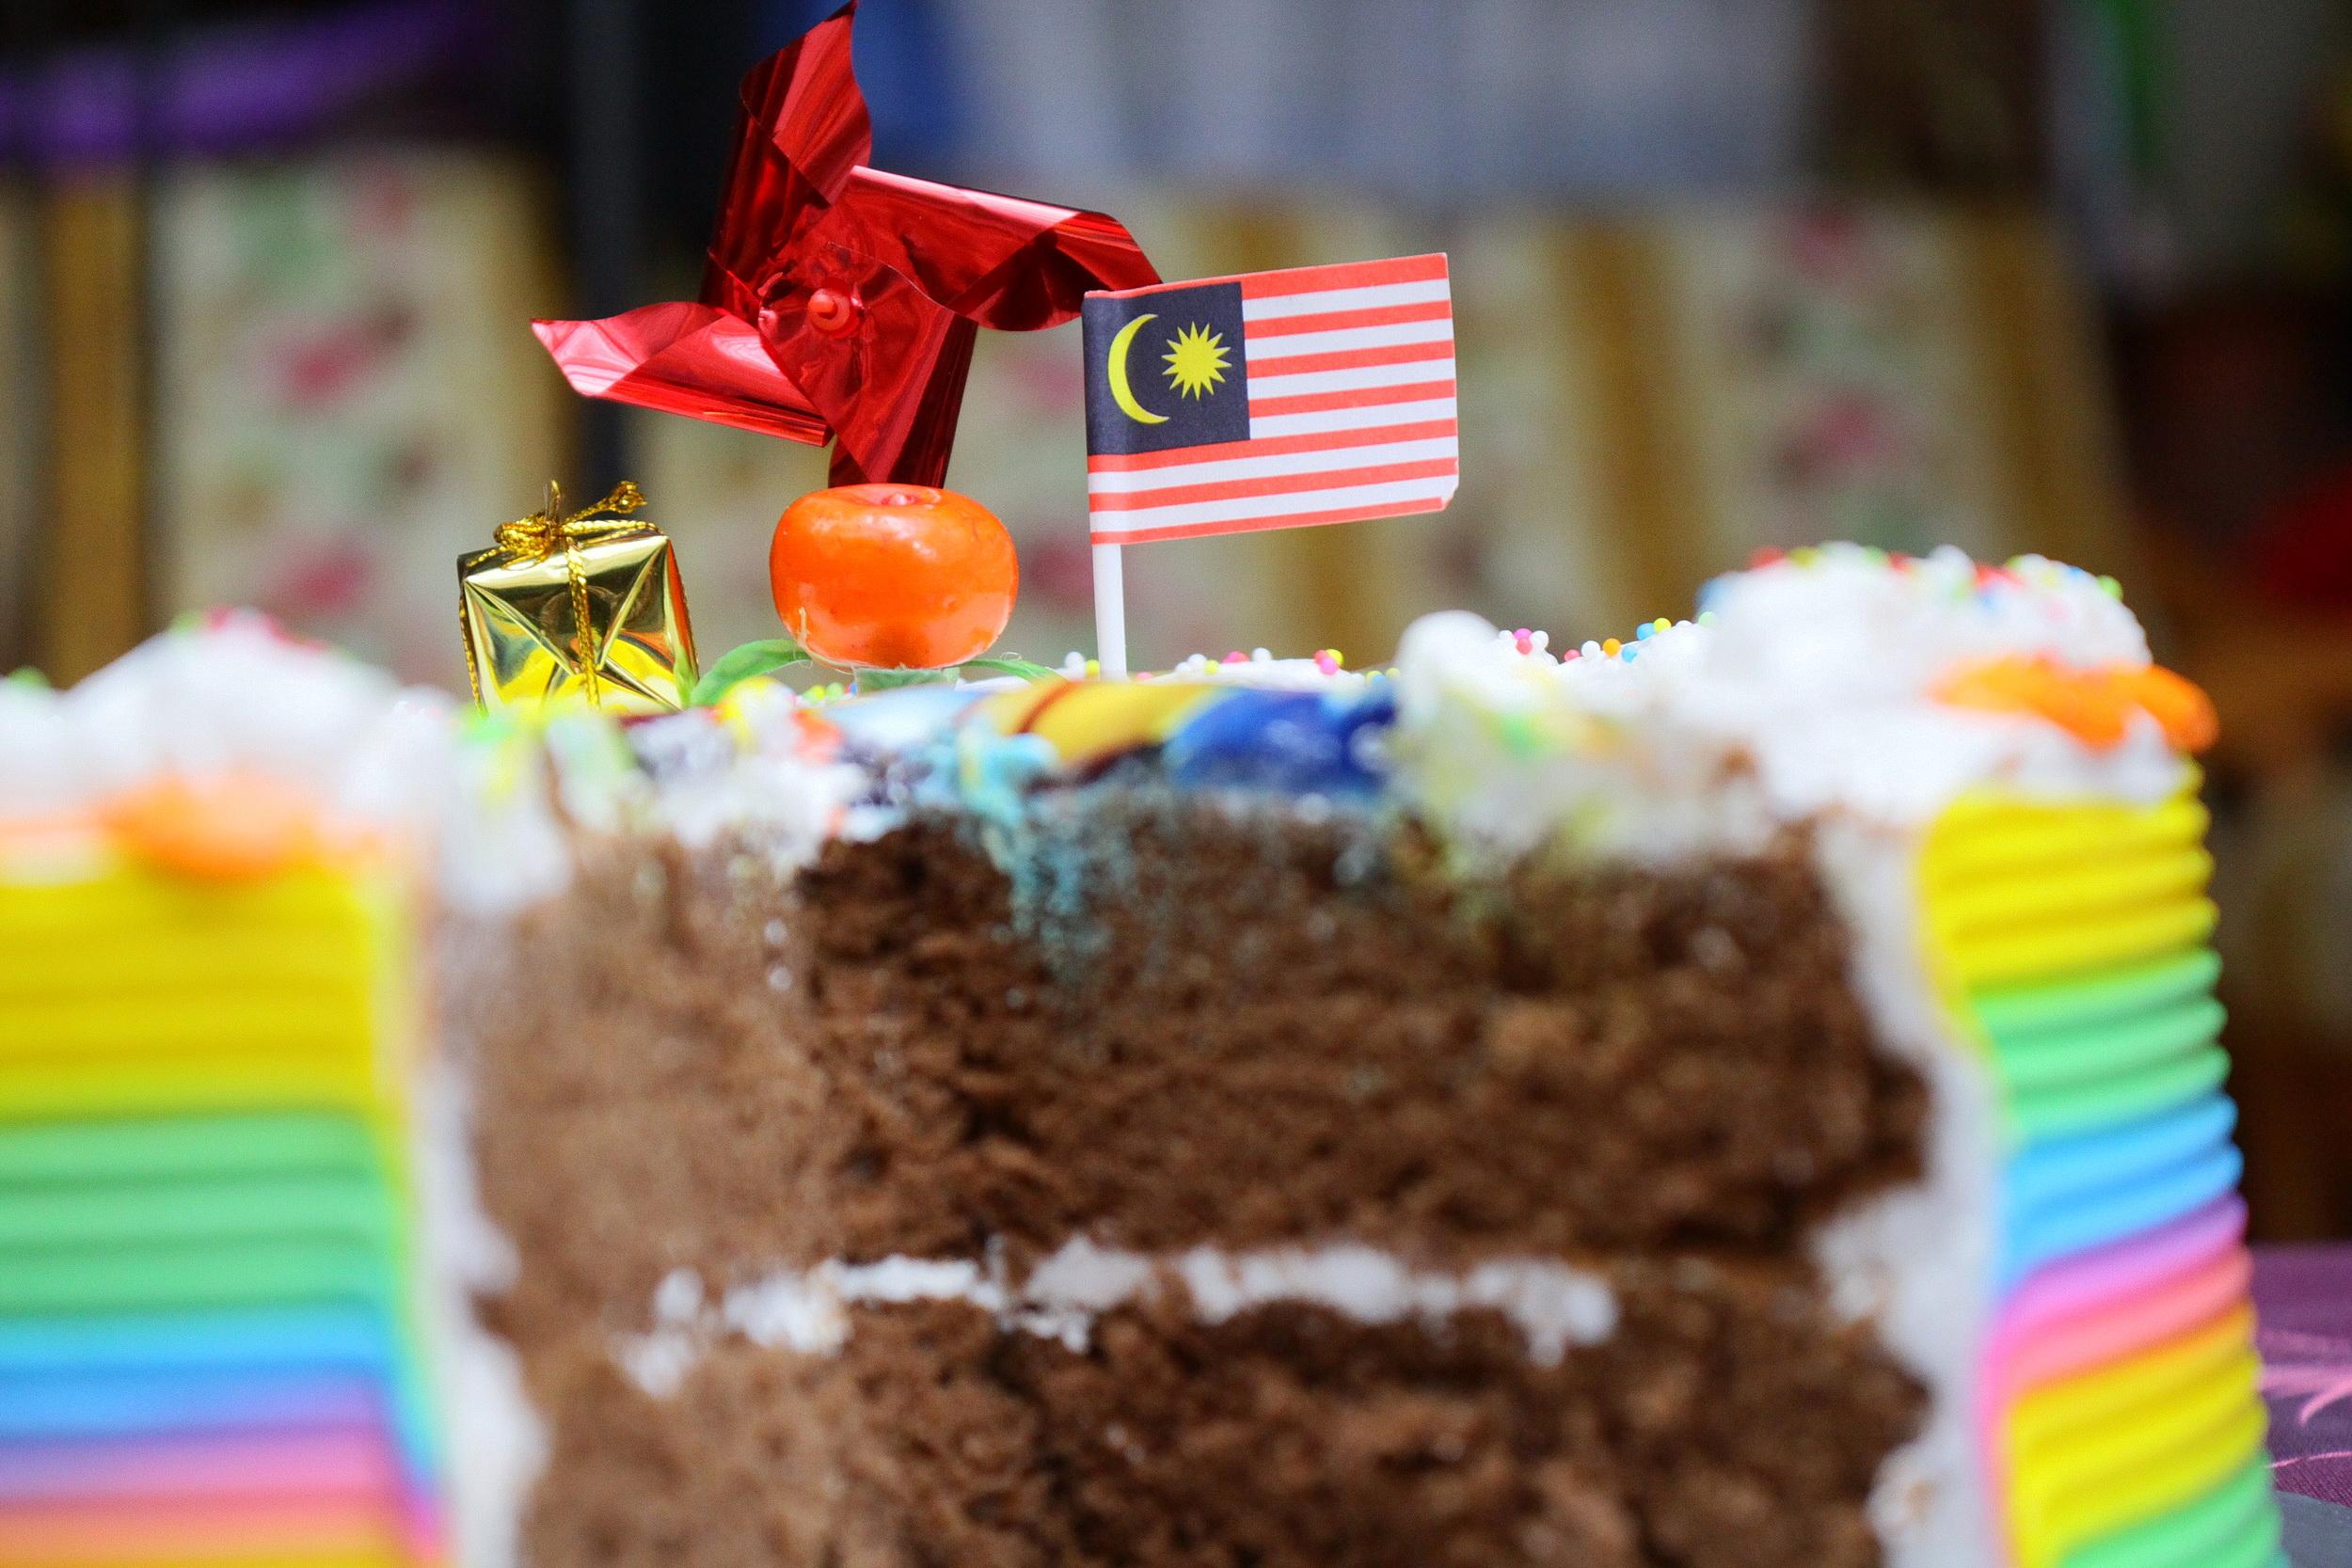 Close-up of Birthday Cake